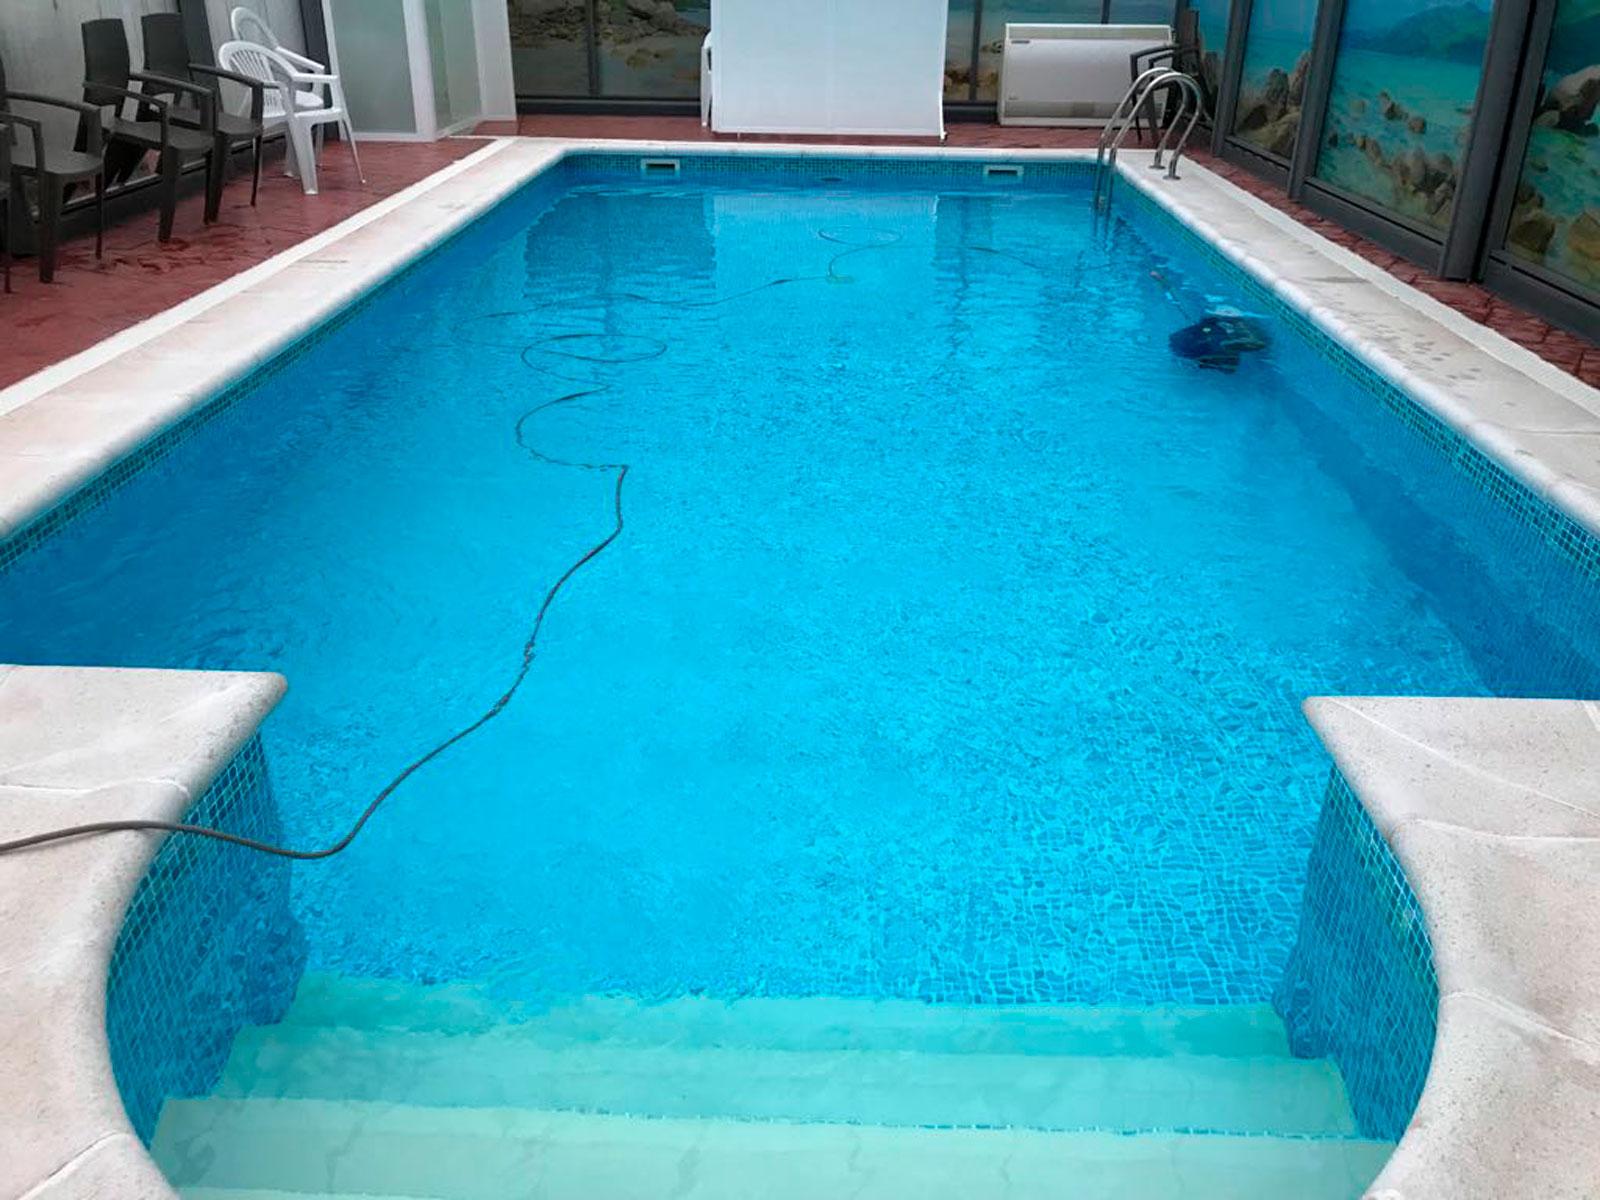 piscina laminada armada con escalera romana